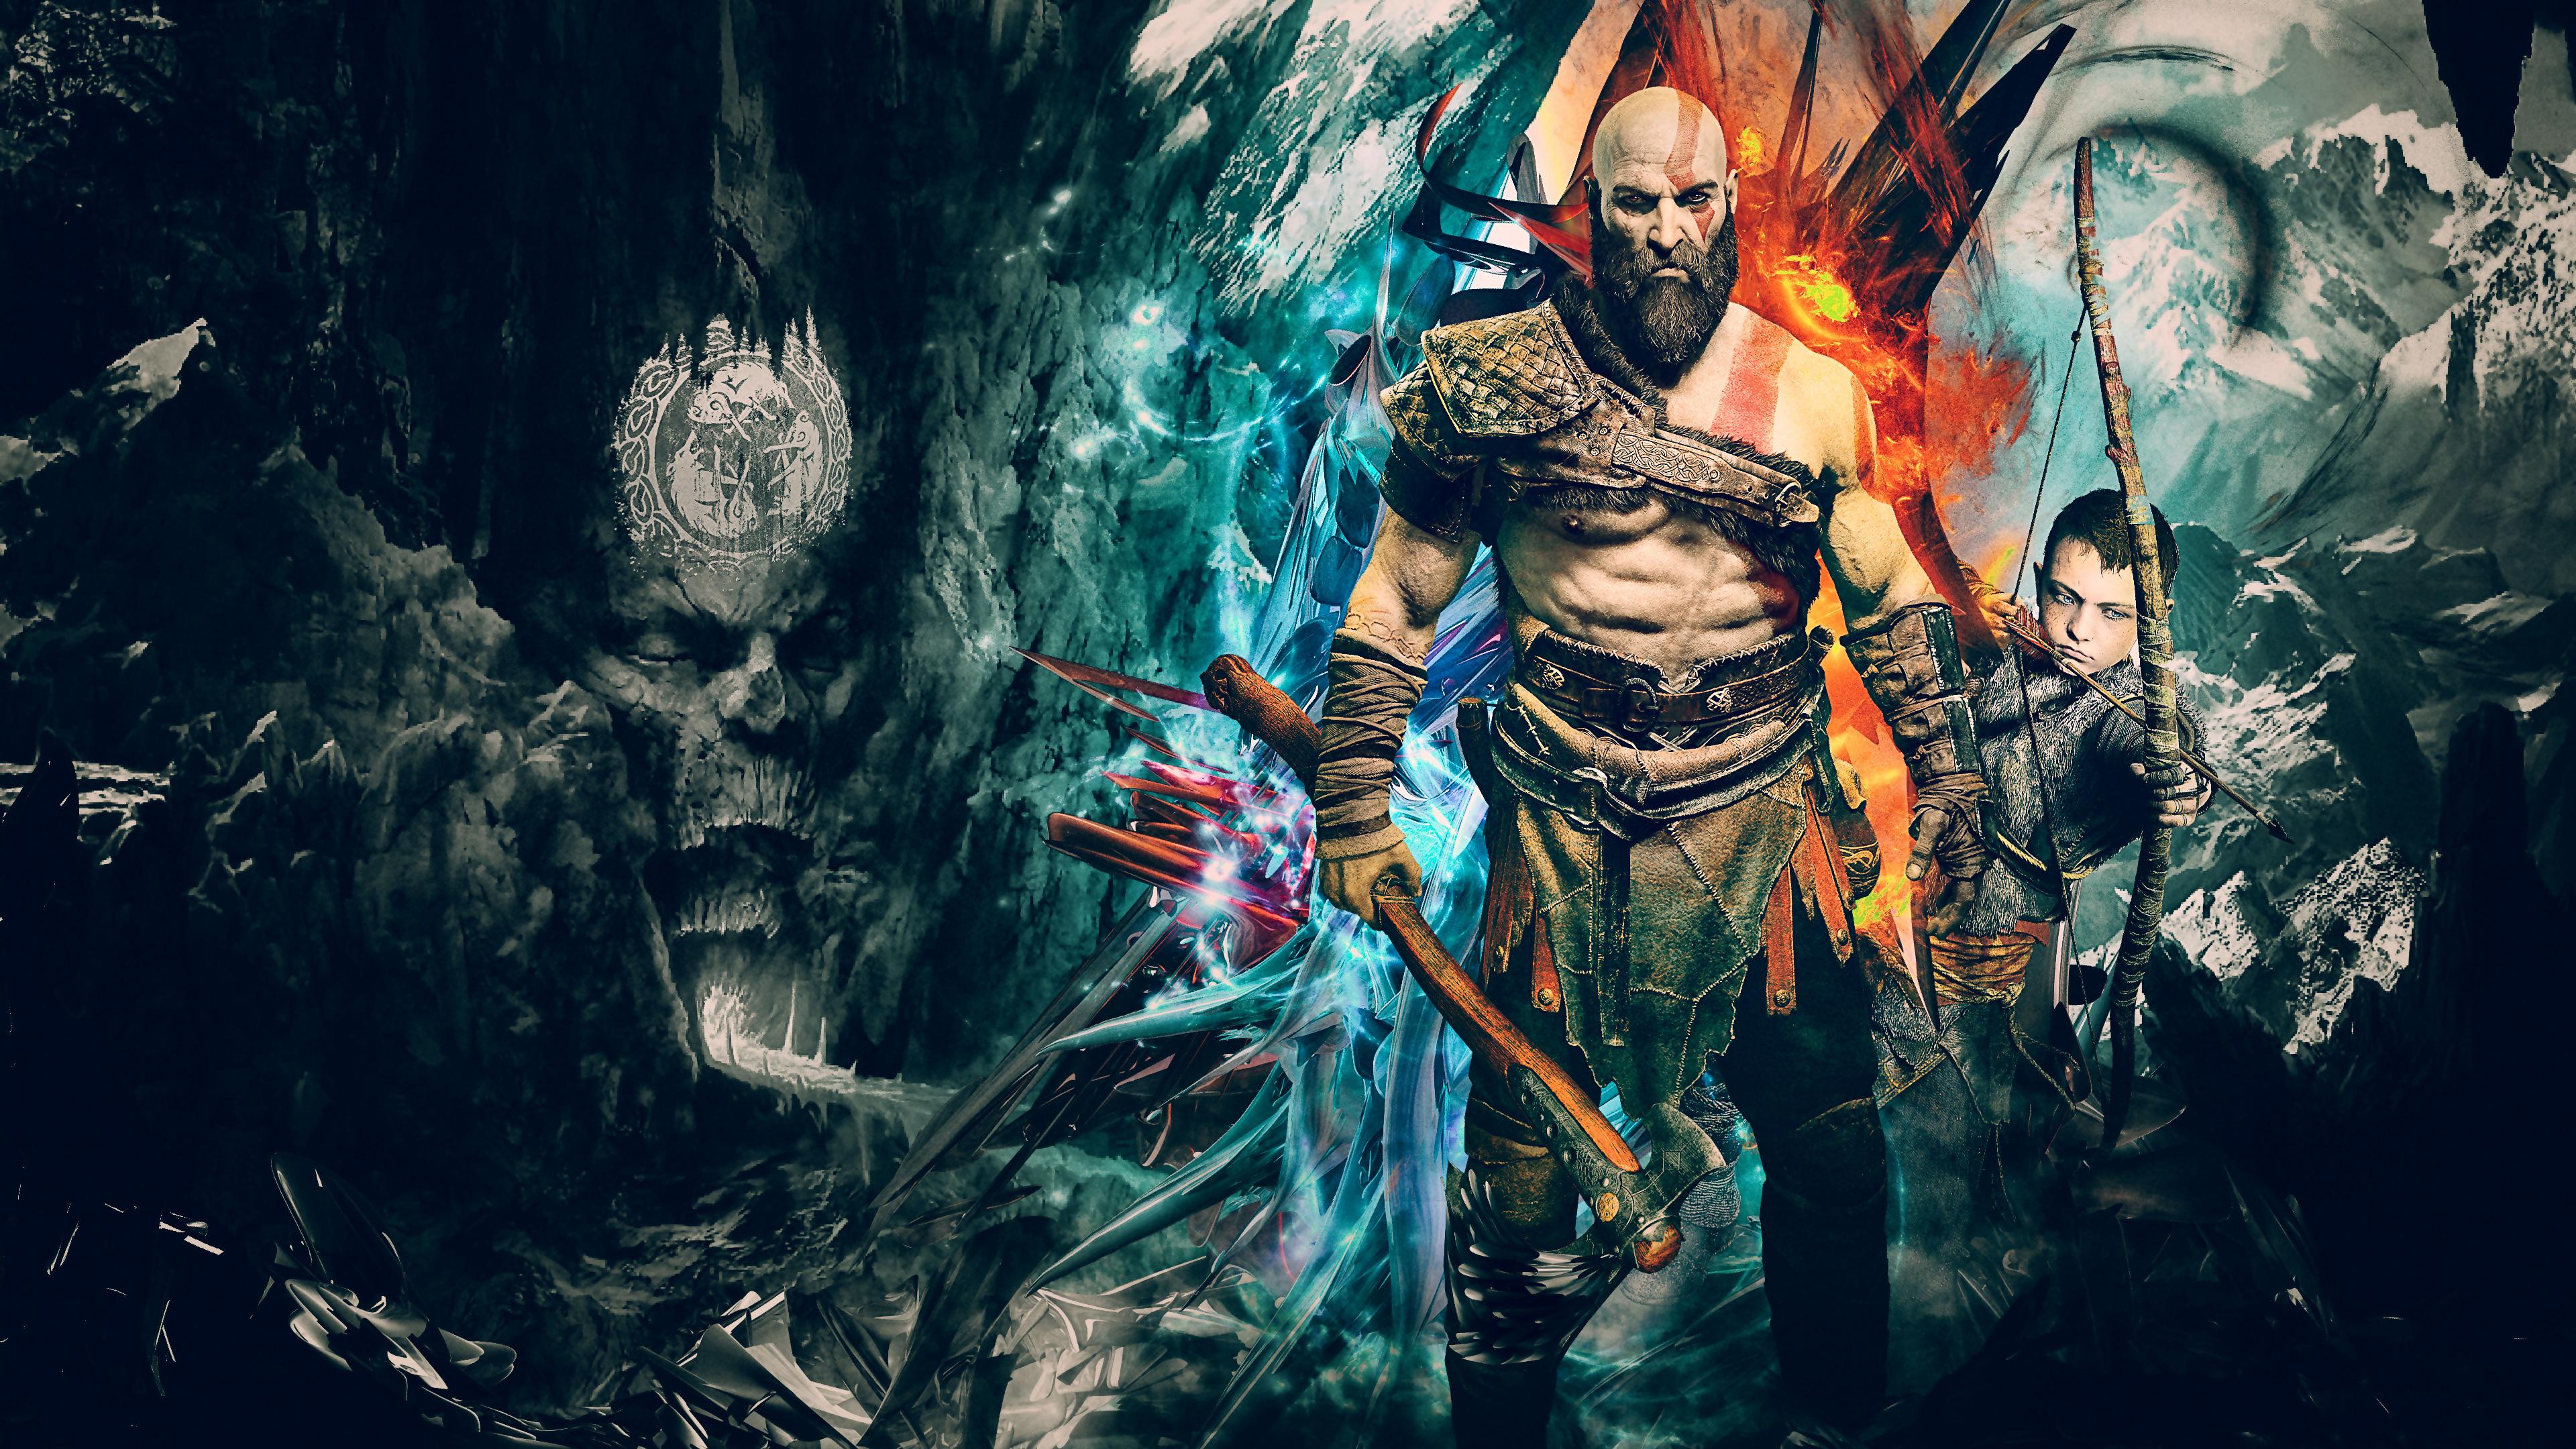 1920x1080 kratos god of war 4k artwork laptop full hd 1080p hd 4k wallpapers images - God of war wallpaper hd 3d ...